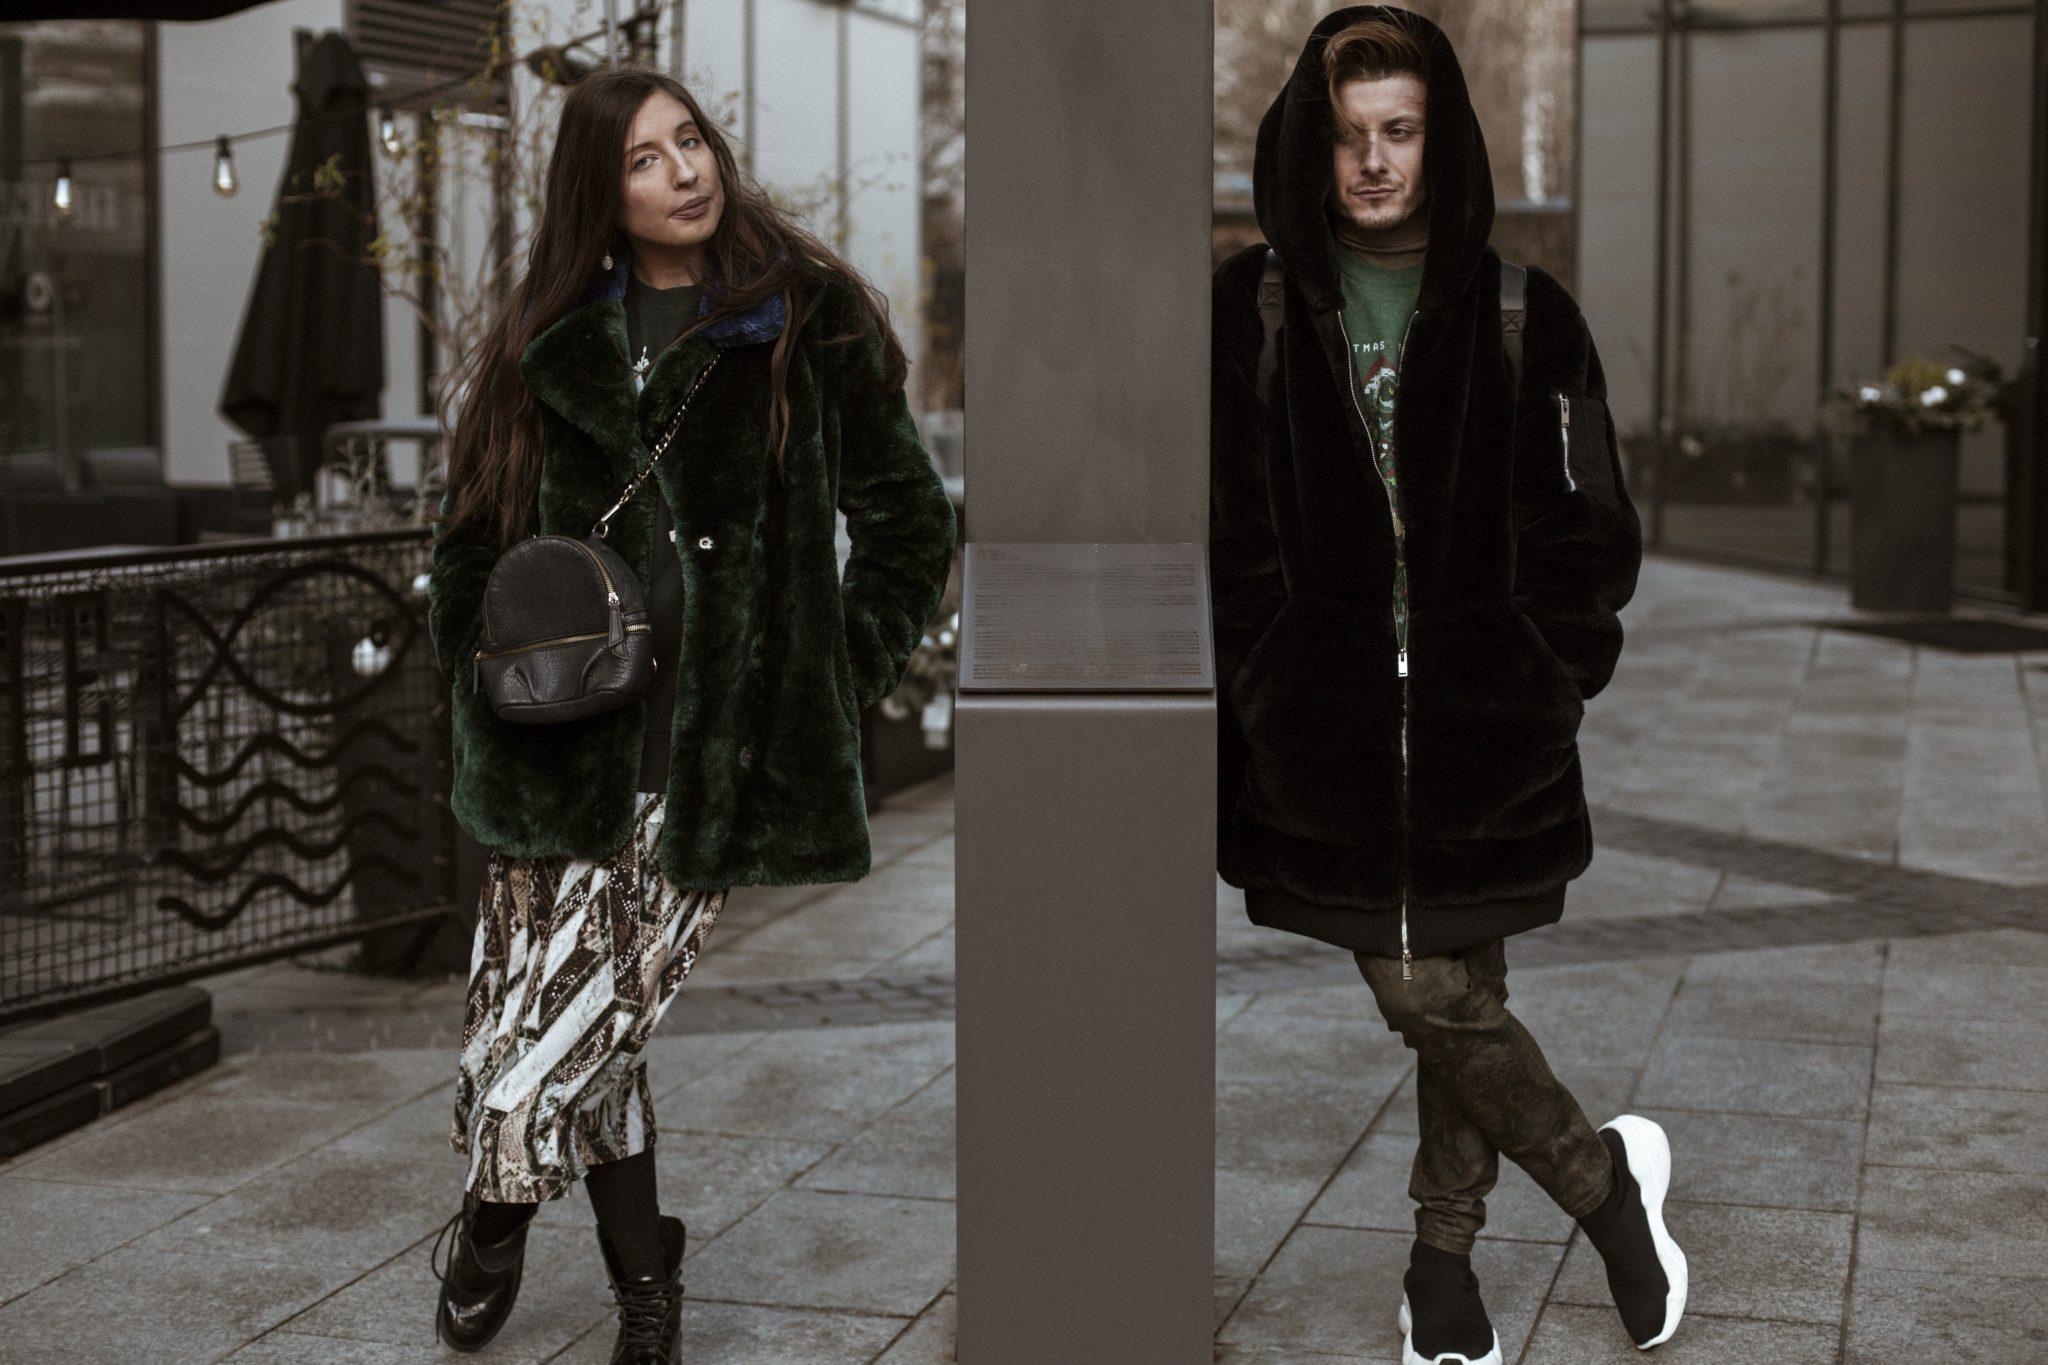 blogerzy-modowi-fashioncouple-matchy-mat